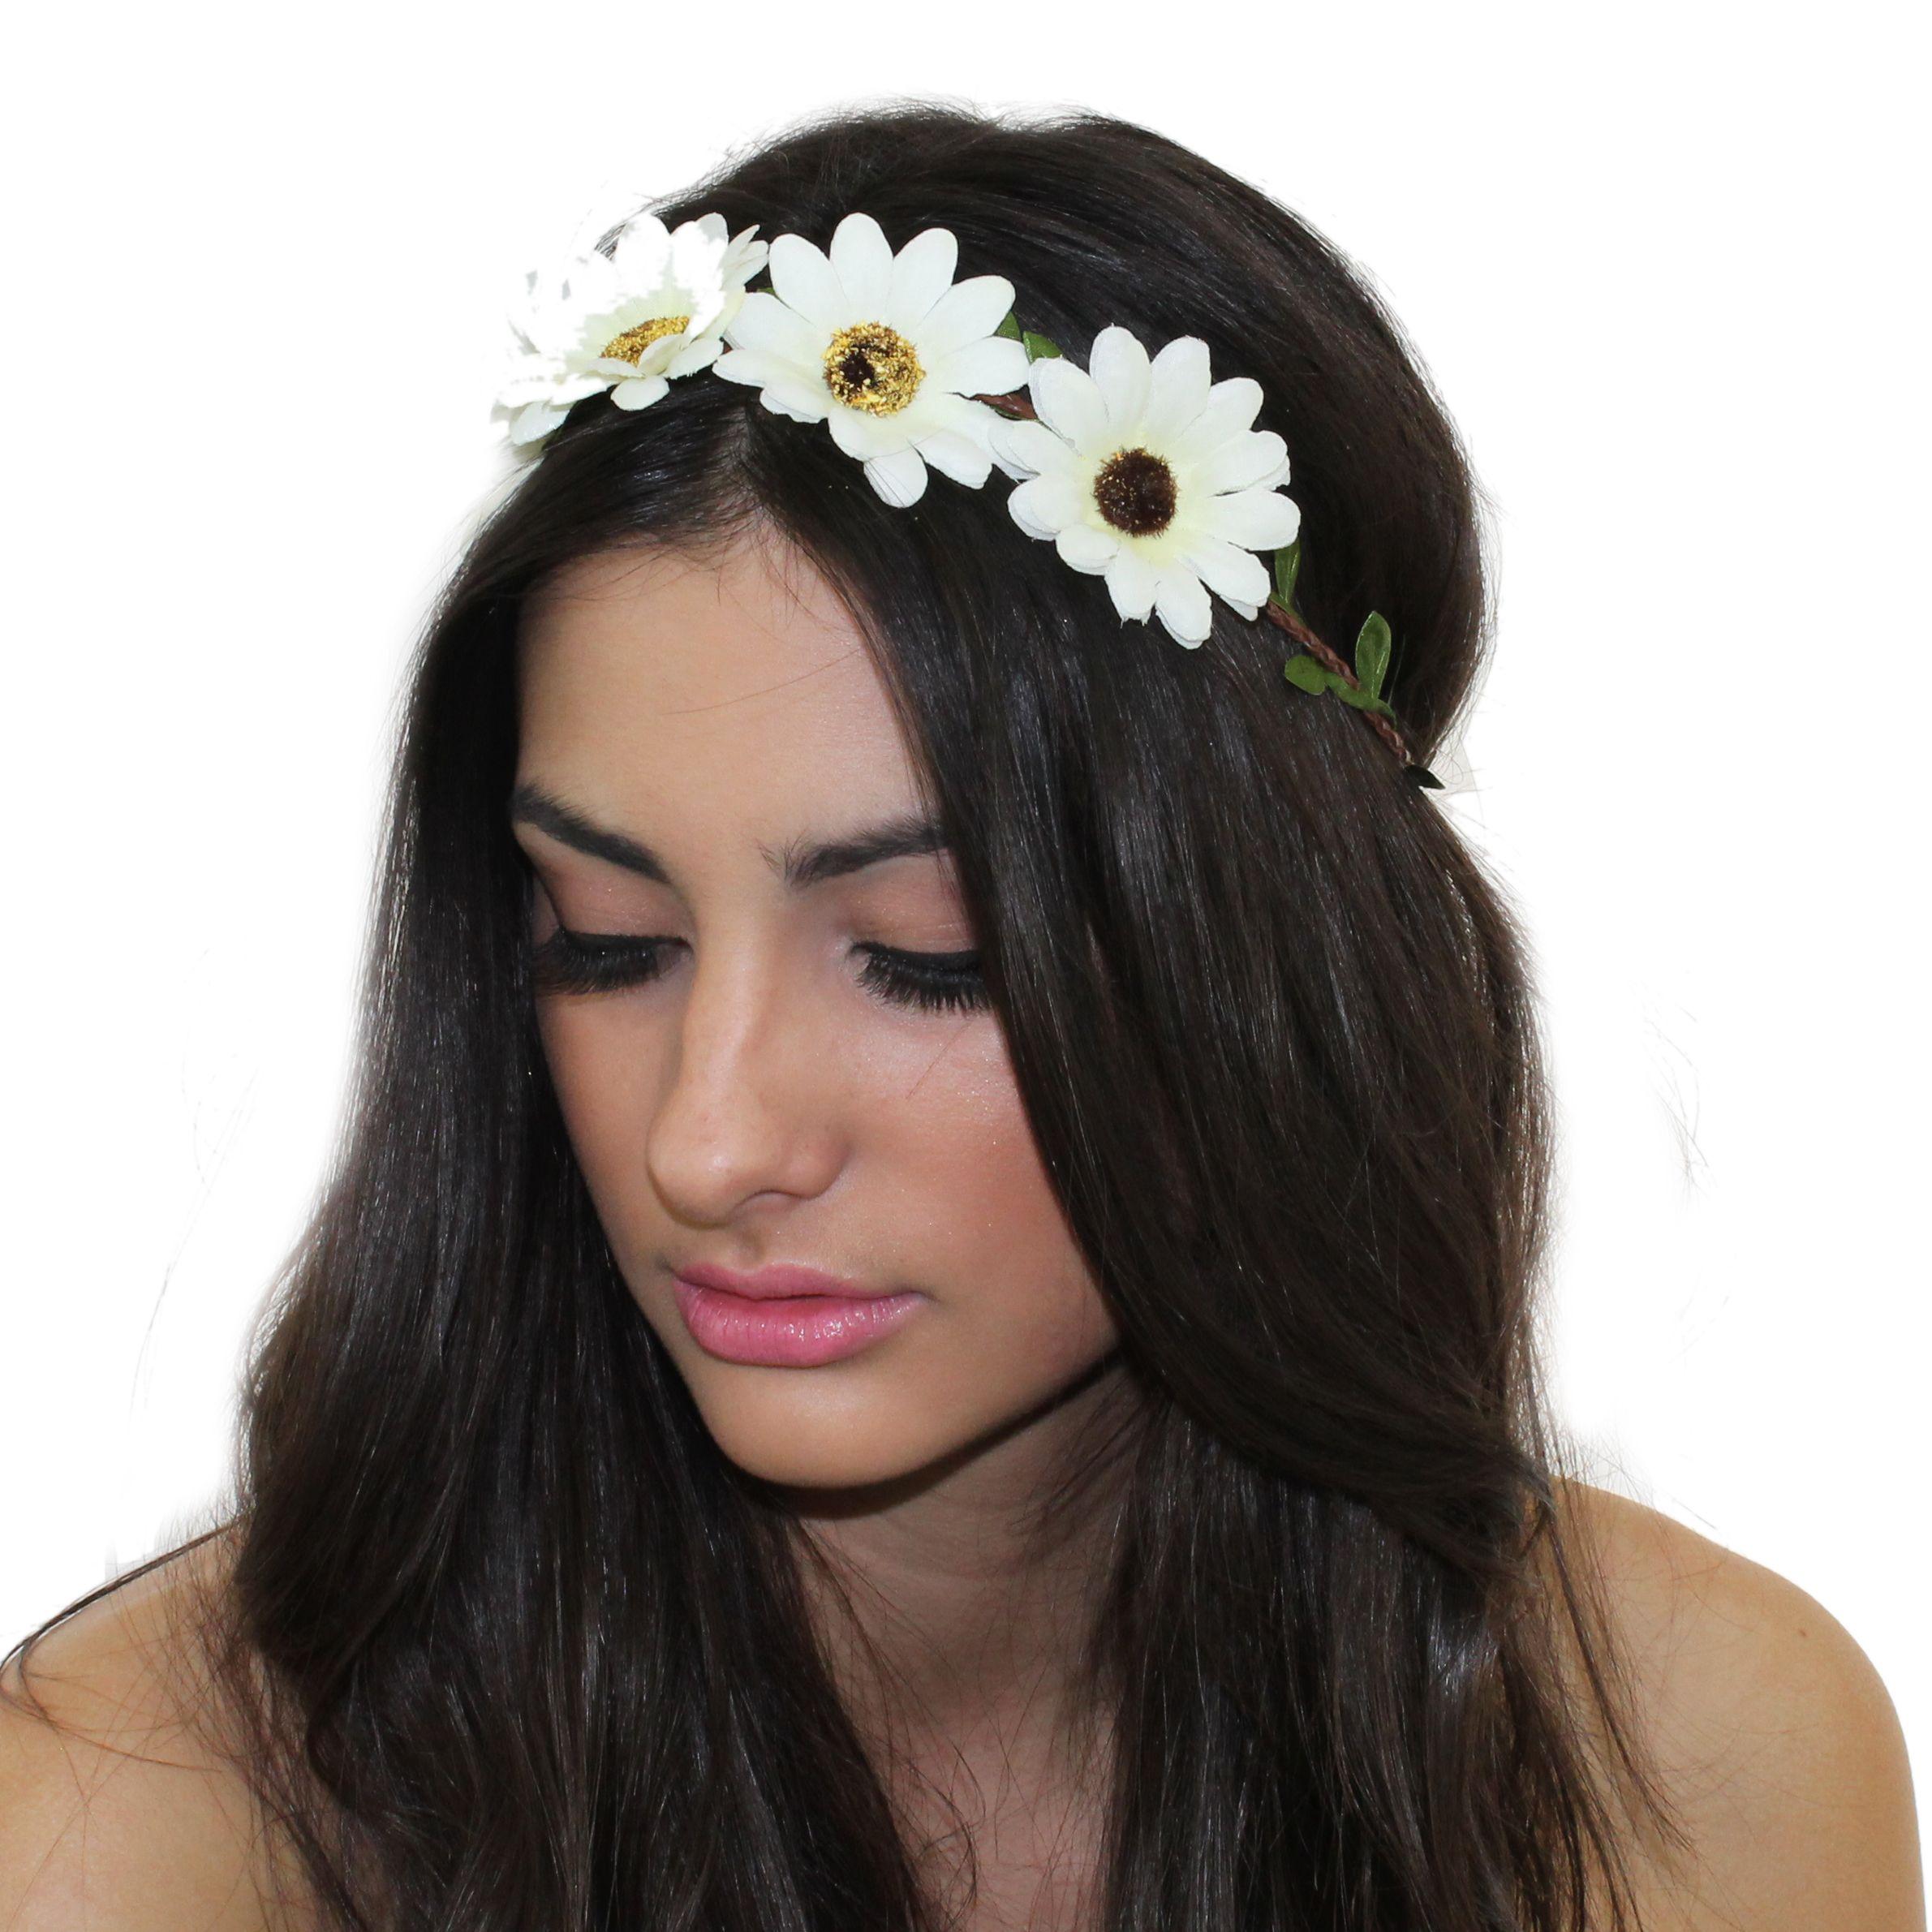 Dainty Daisy Flower Crown Kristin Perry Accessories Coachella